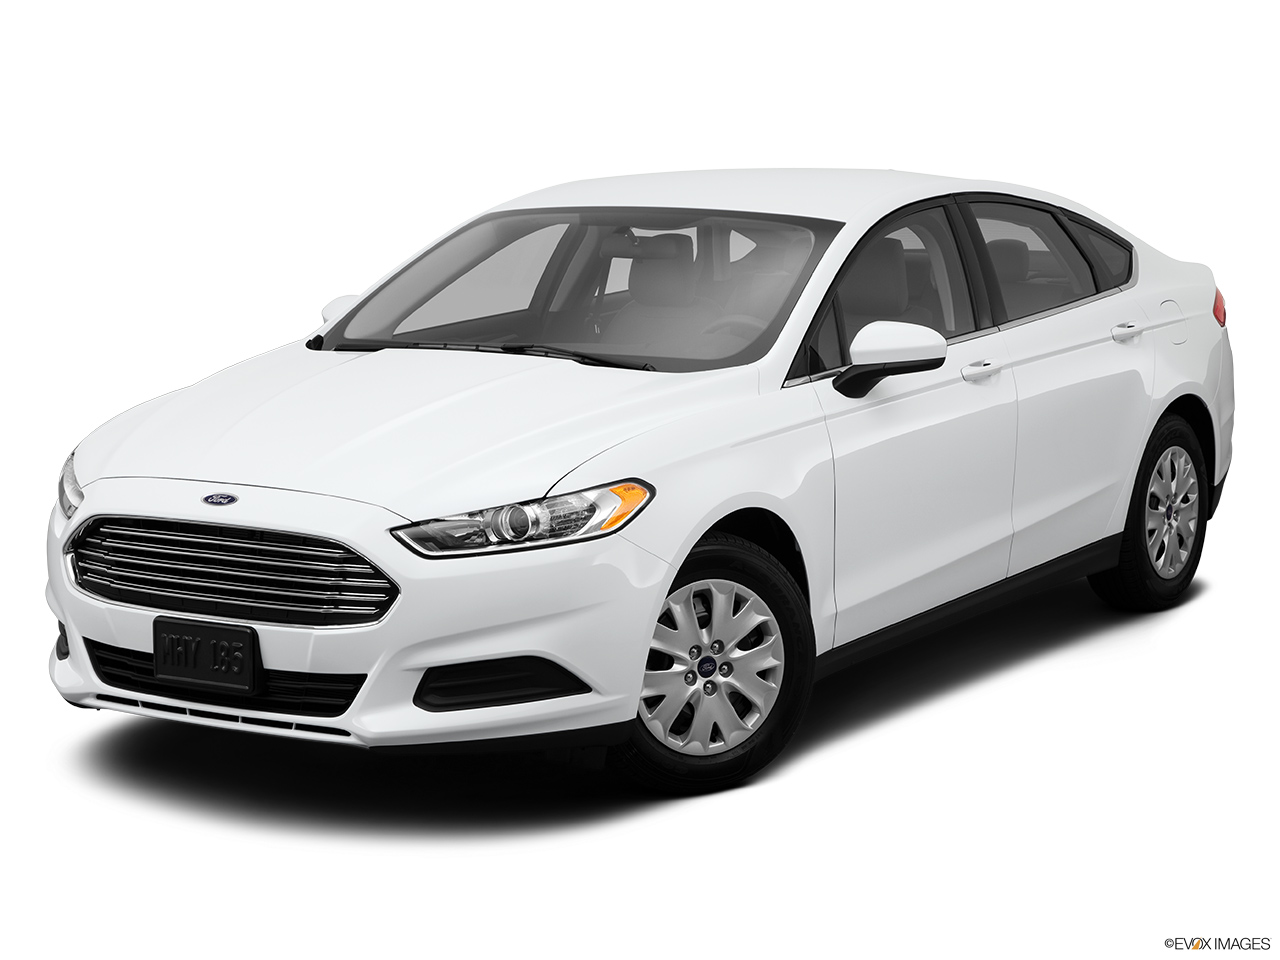 2014 Ford Fusion Sedan S Fwd